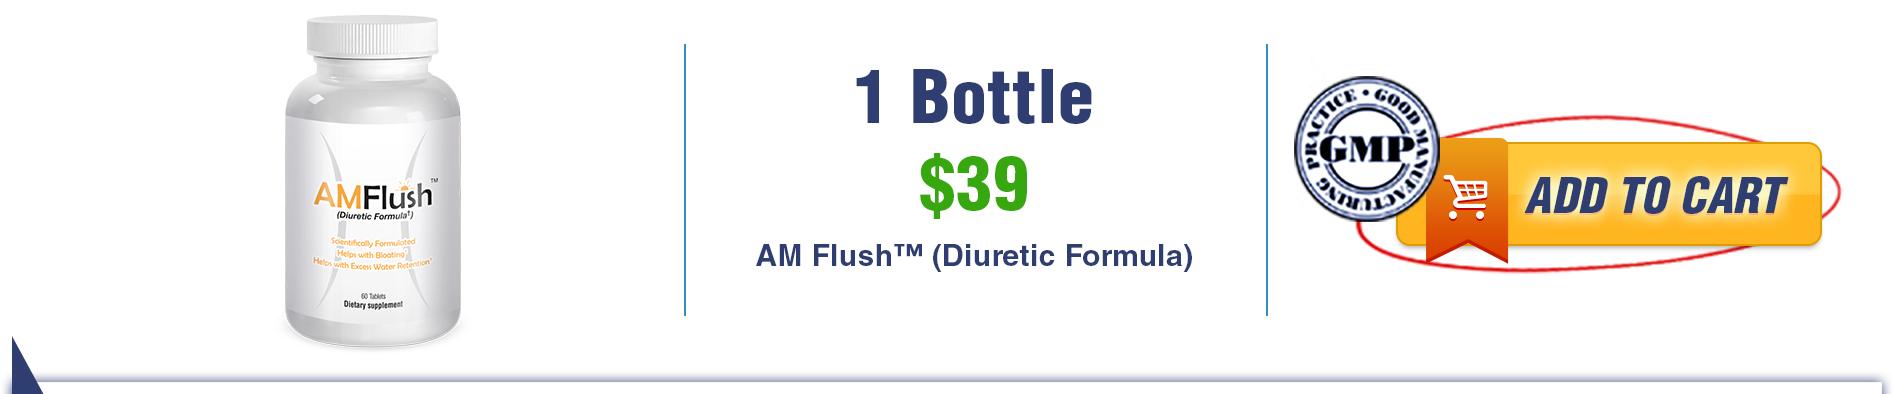 order-amflush-1bottle